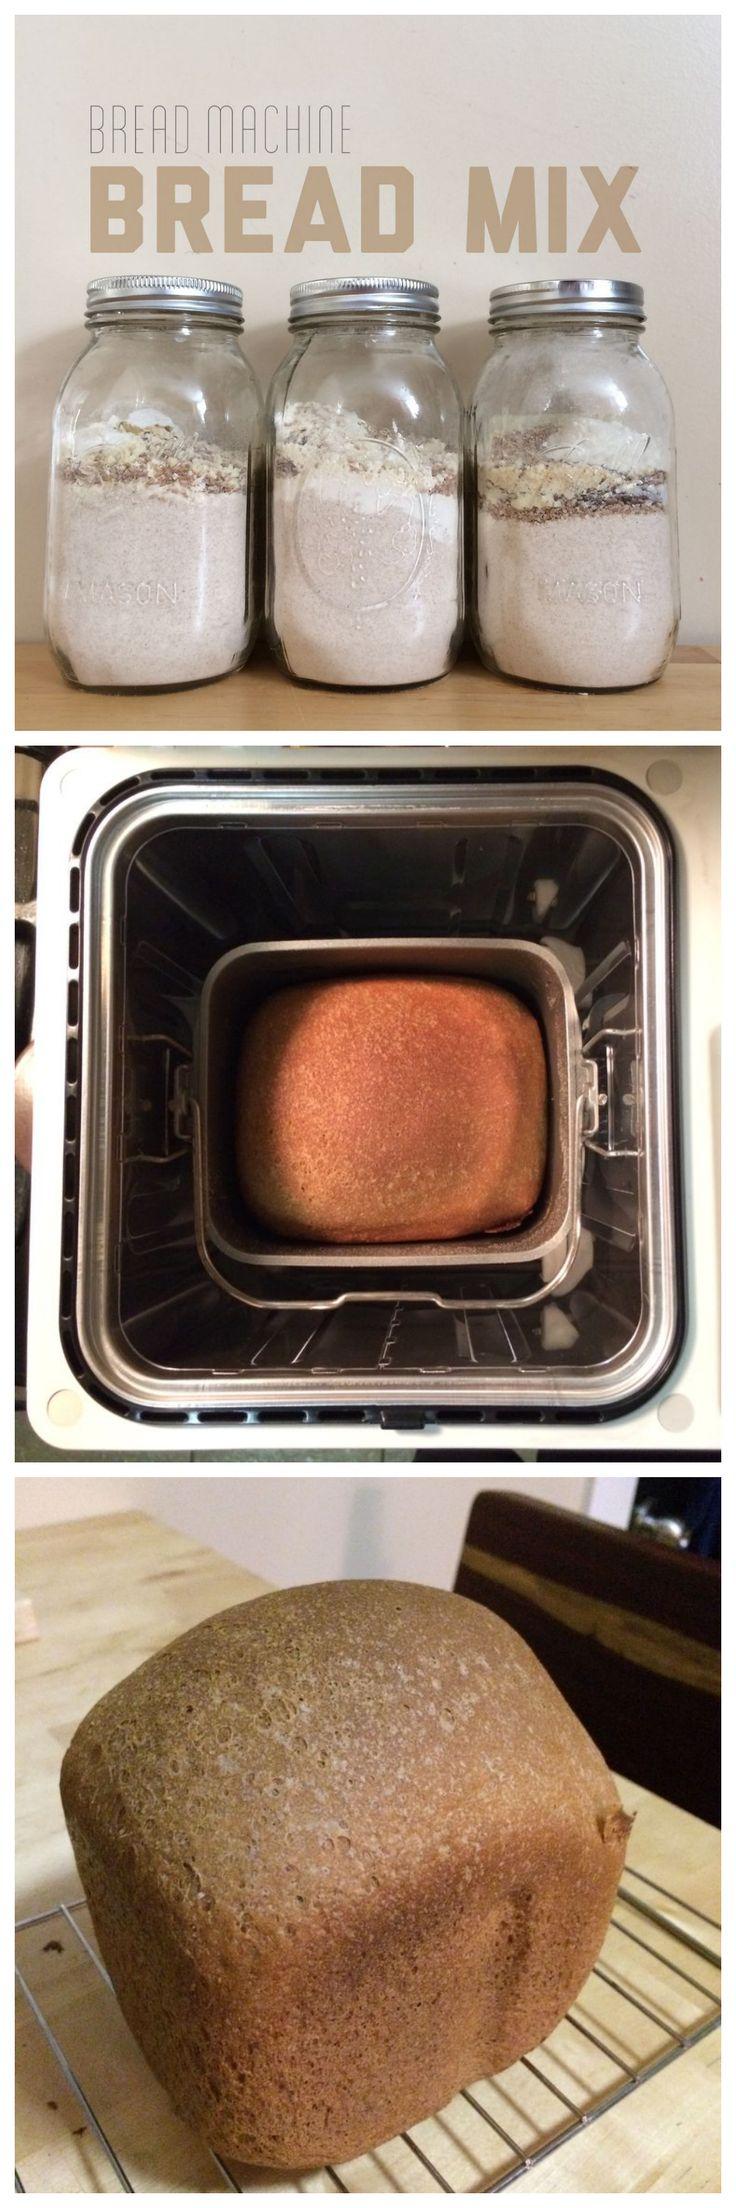 DIY Bread Machine Bread Mix in a Mason Jar #recipe #baking